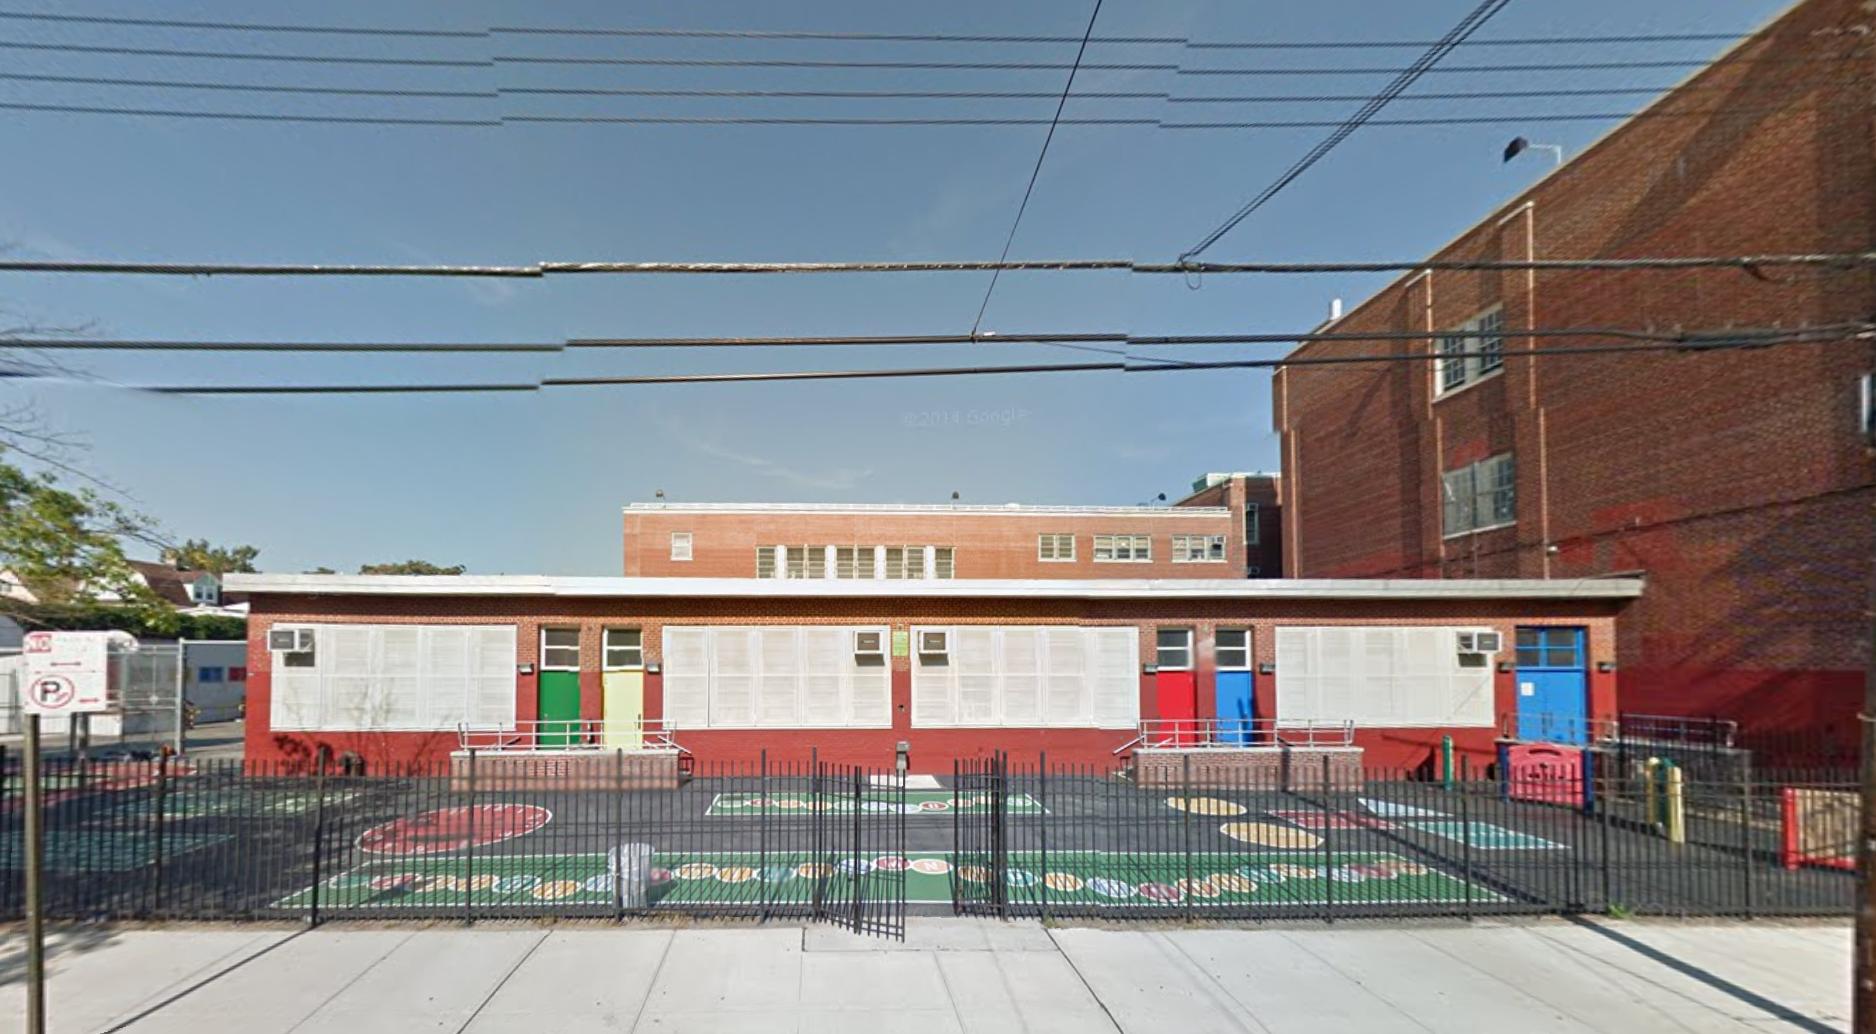 45-57 Union Street, image via Google Maps